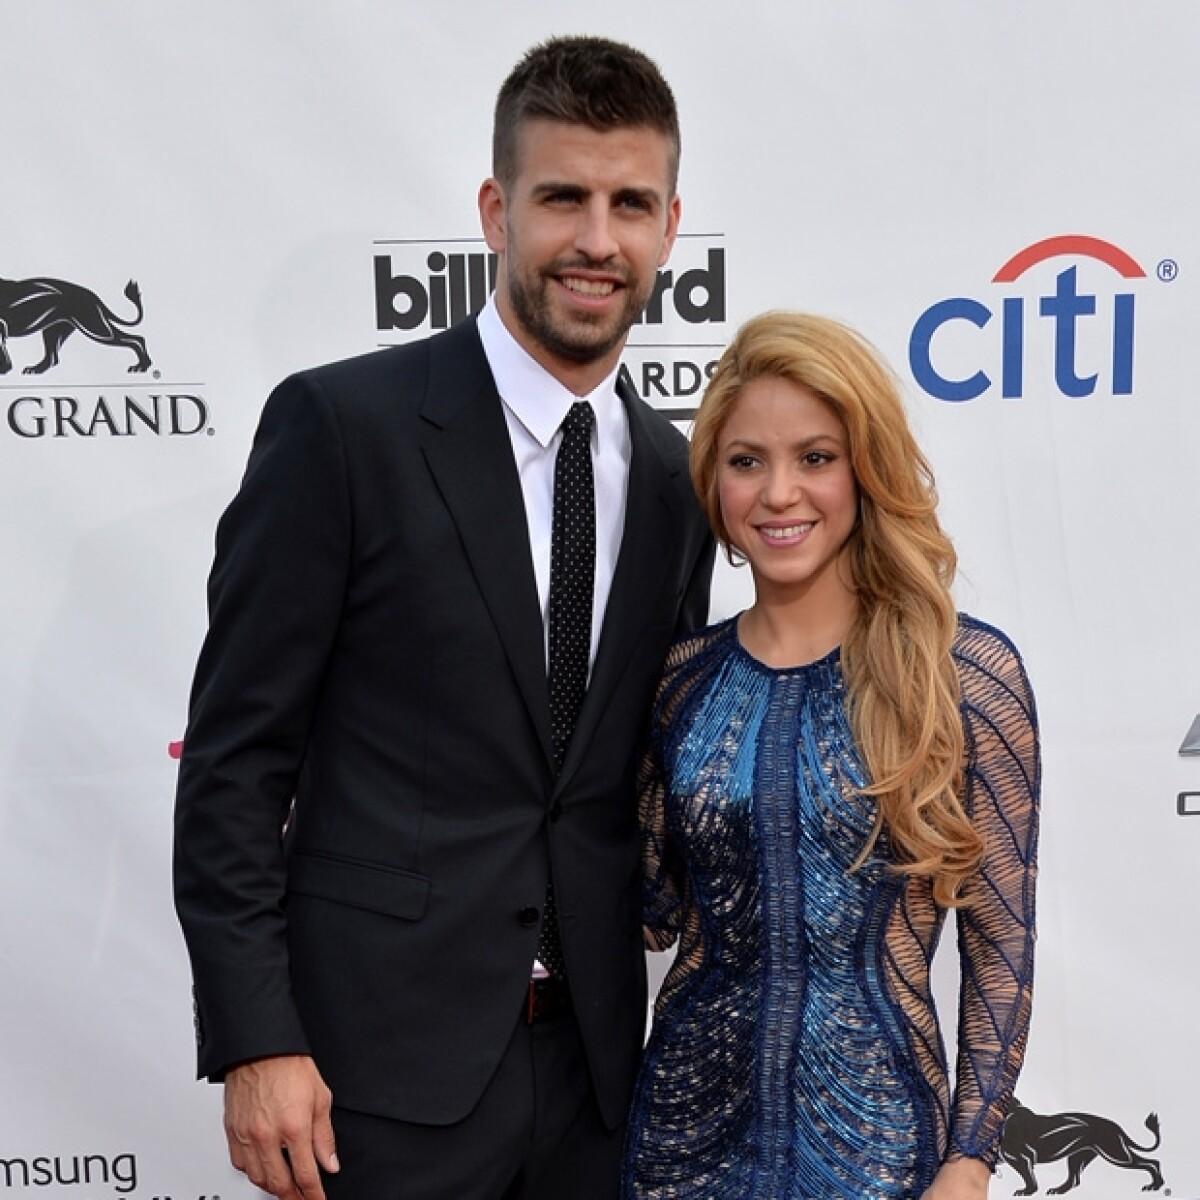 Tras eliminación de España, Shakira da su apoyo a Colombia